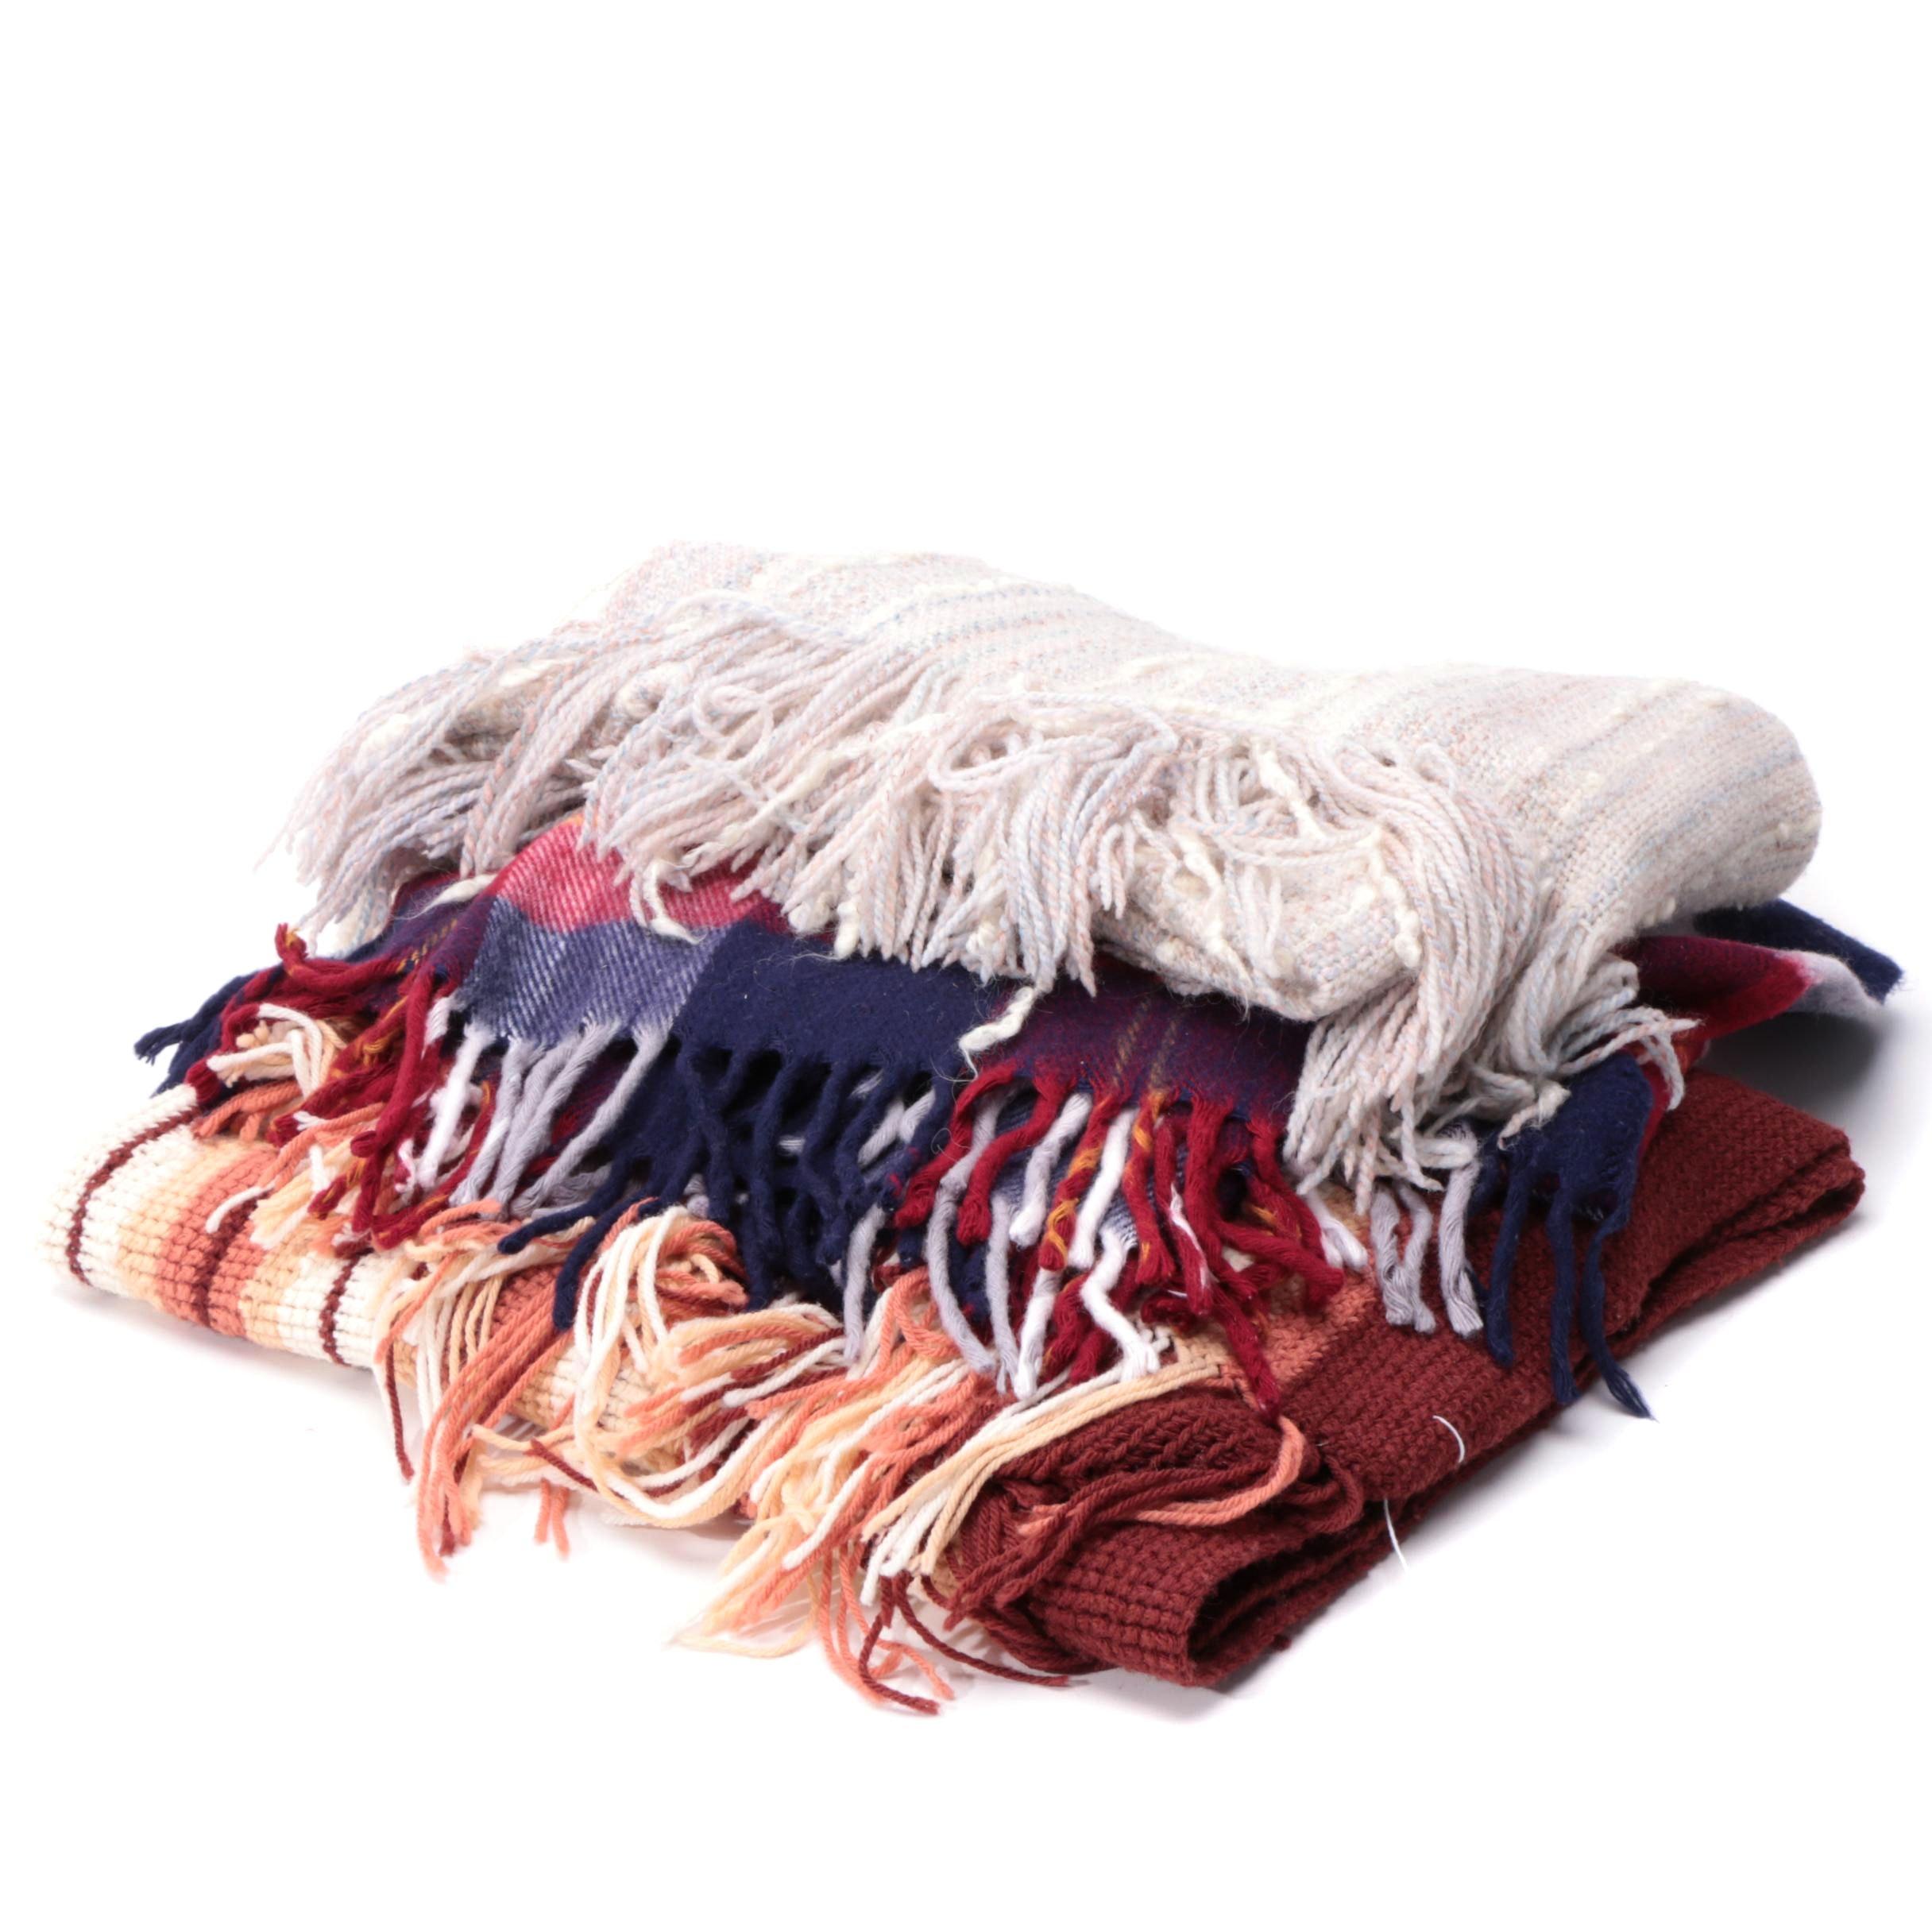 Faribault Plaid Wool Throw Blanket with Knit Afghans